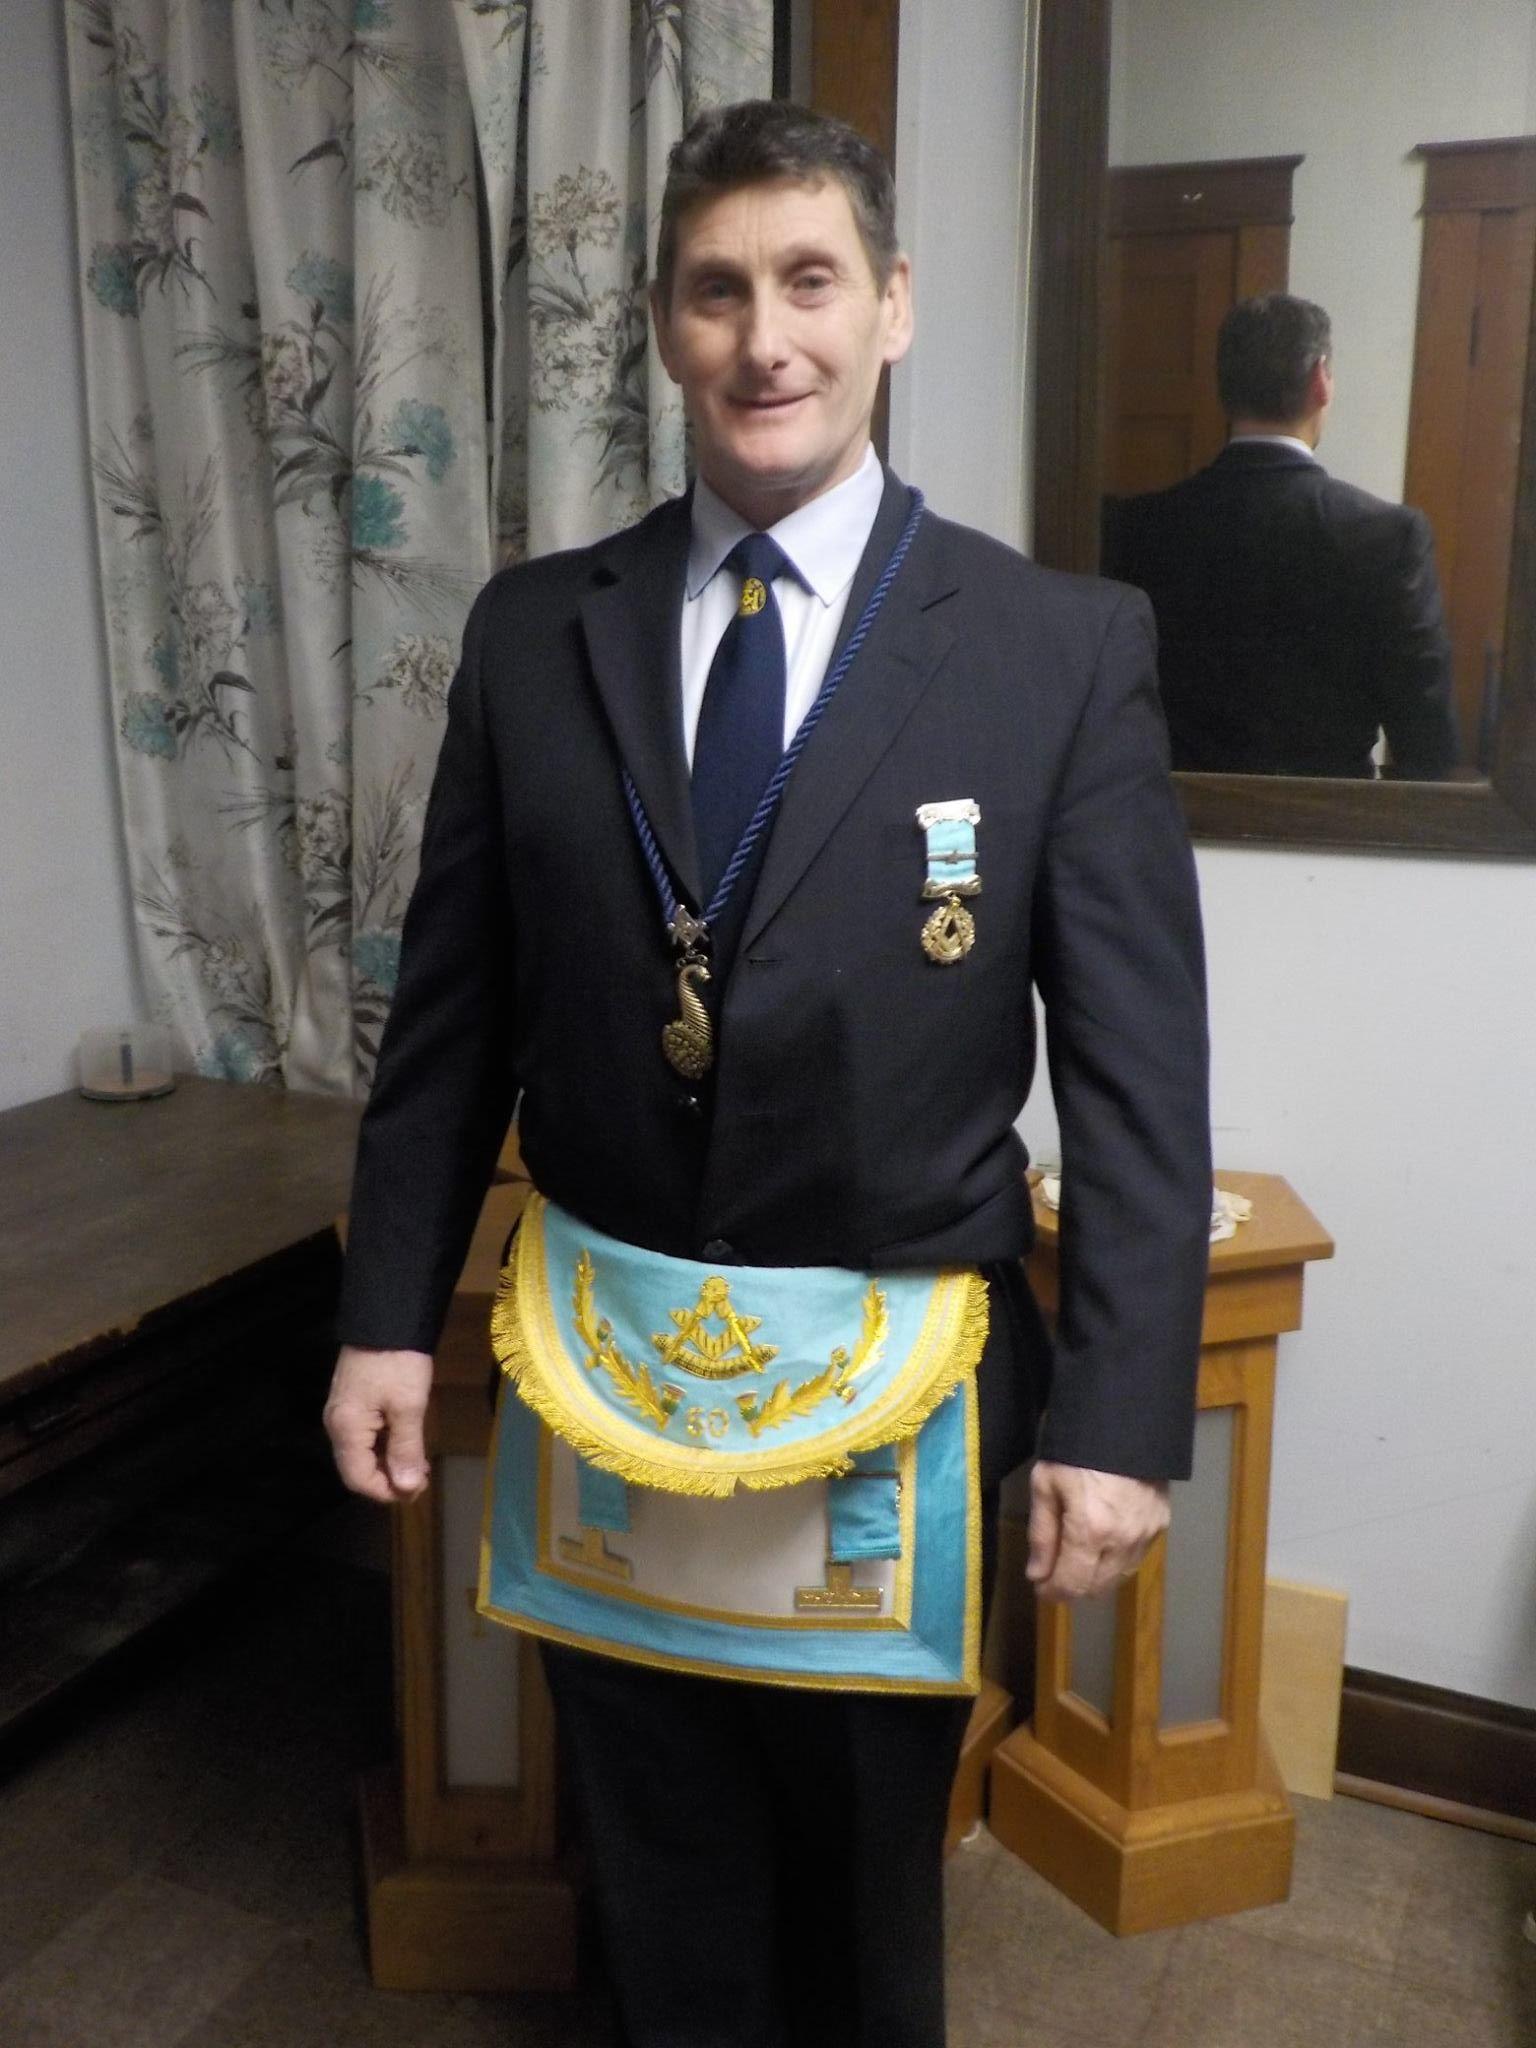 Craig Campbell Inverary Scotland